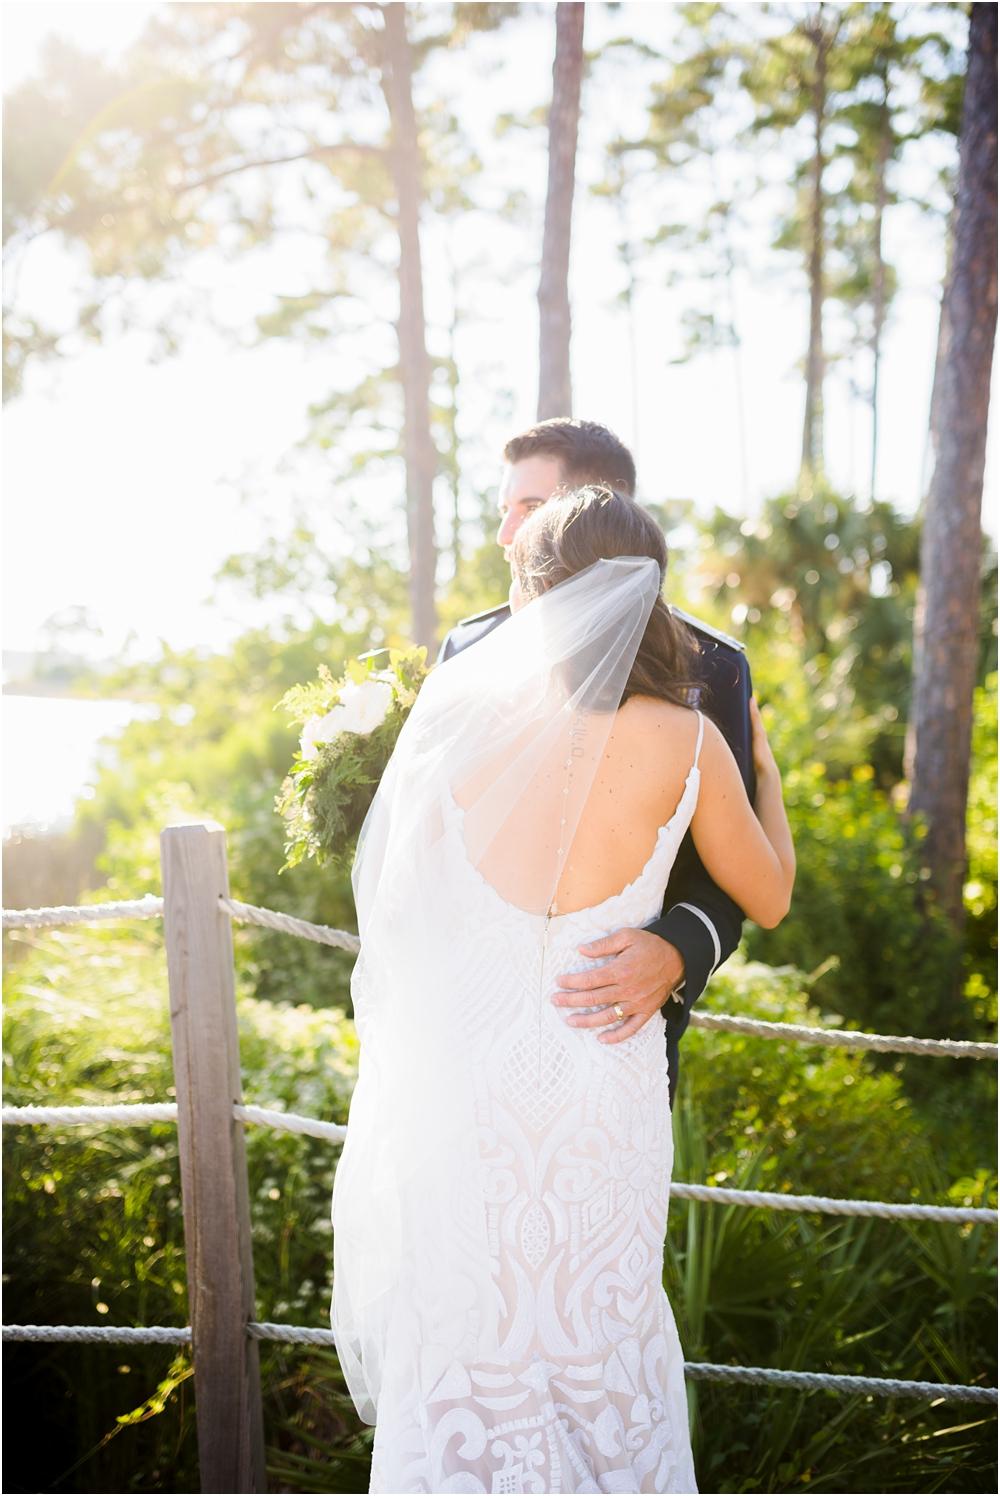 amack-wedding-kiersten-stevenson-photography-30a-panama-city-beach-dothan-tallahassee-(227-of-882).JPG